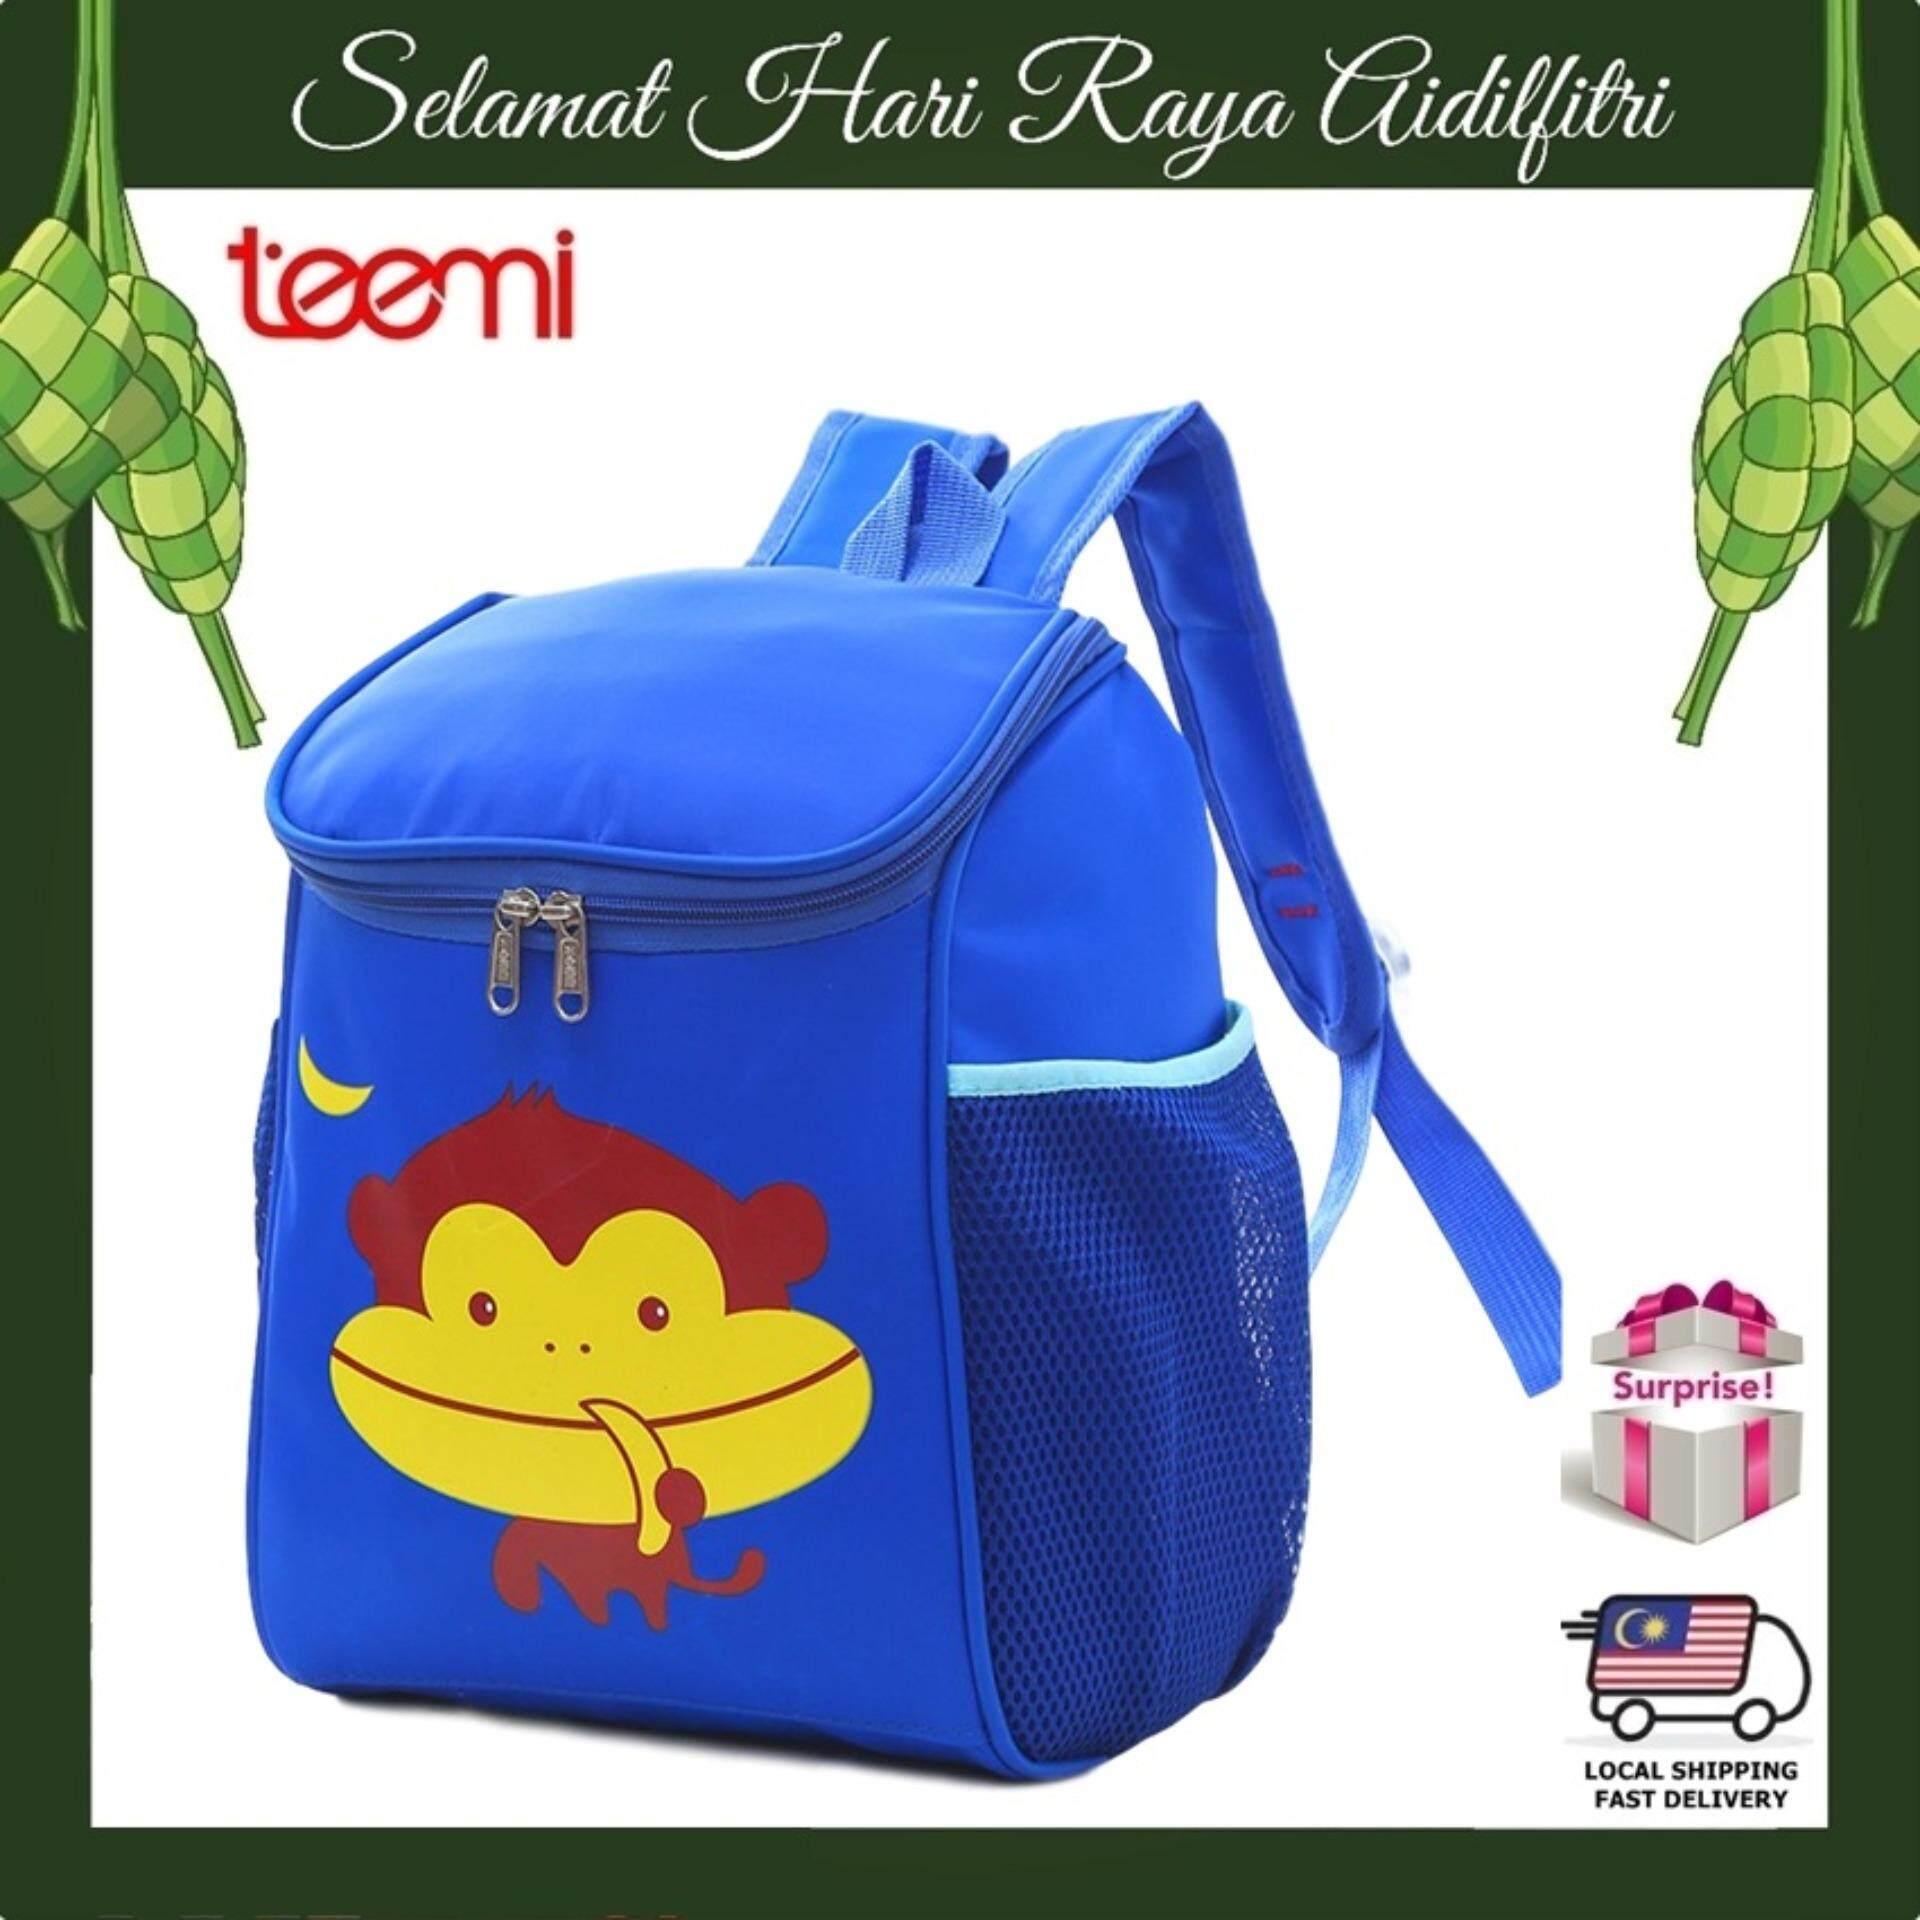 TEEMI Cartoon Animal School Bag Candy Colors Backpack Nursery Kindergarten Kids Children Toddler - Dark Blue